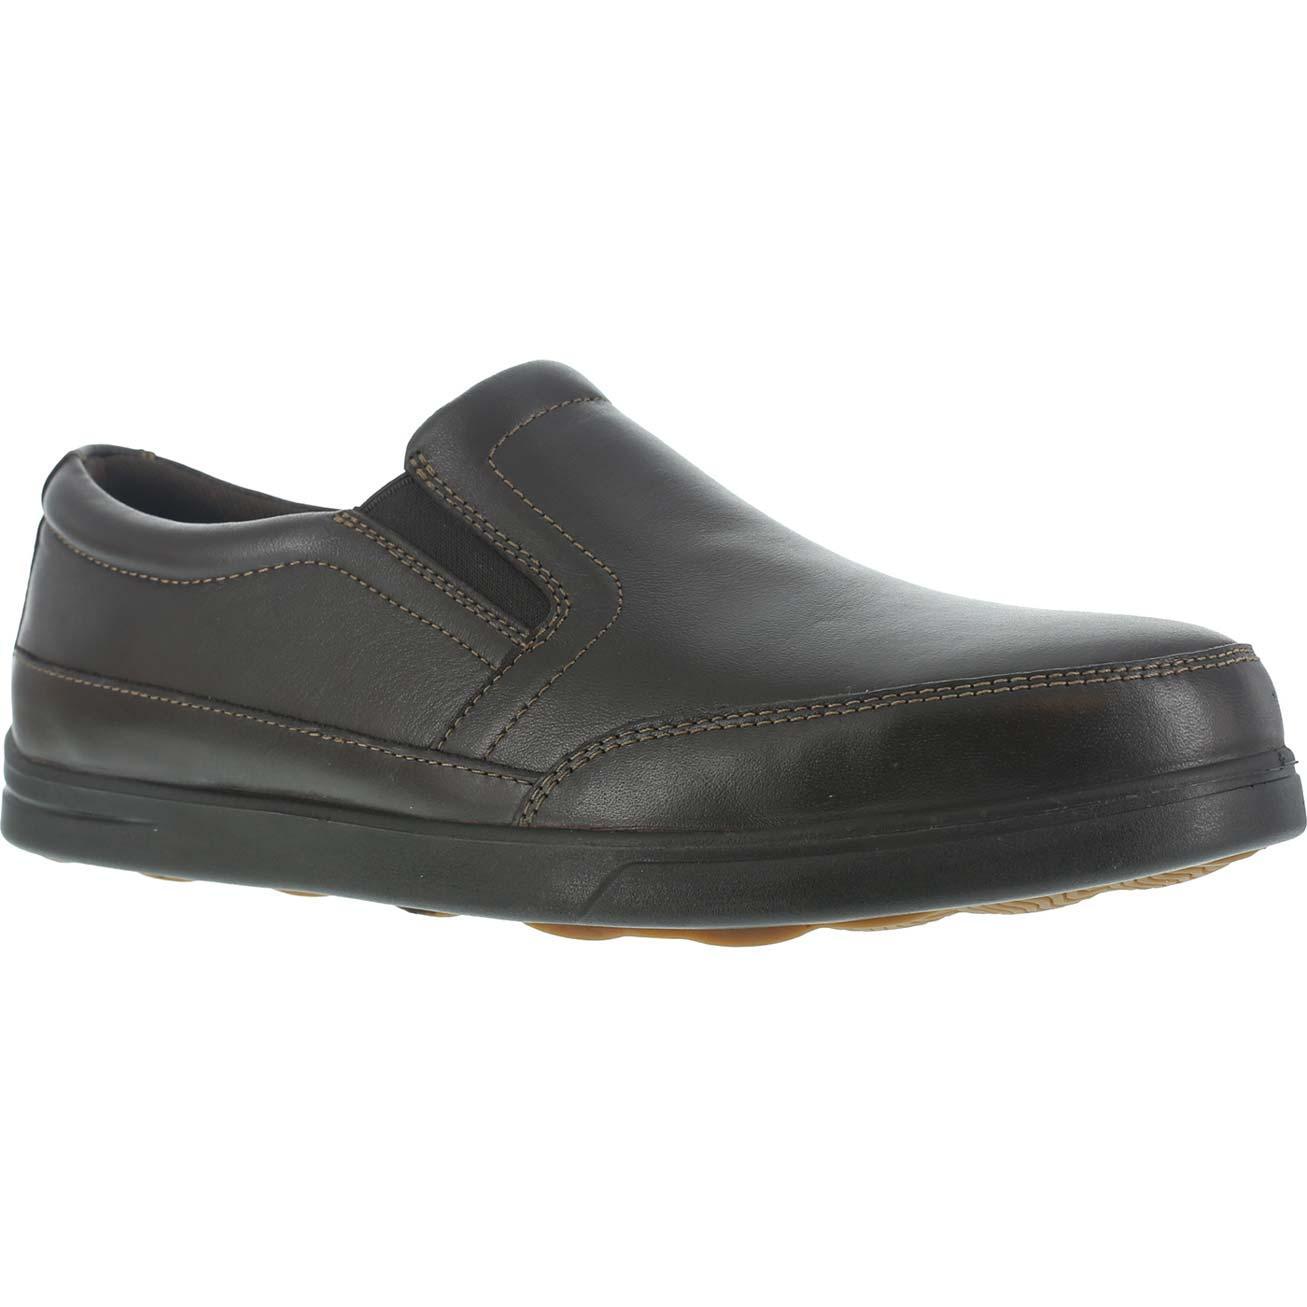 FLORSHEIM WORK Men's Stoss Steel Toe Oxford Work Shoes, Brown